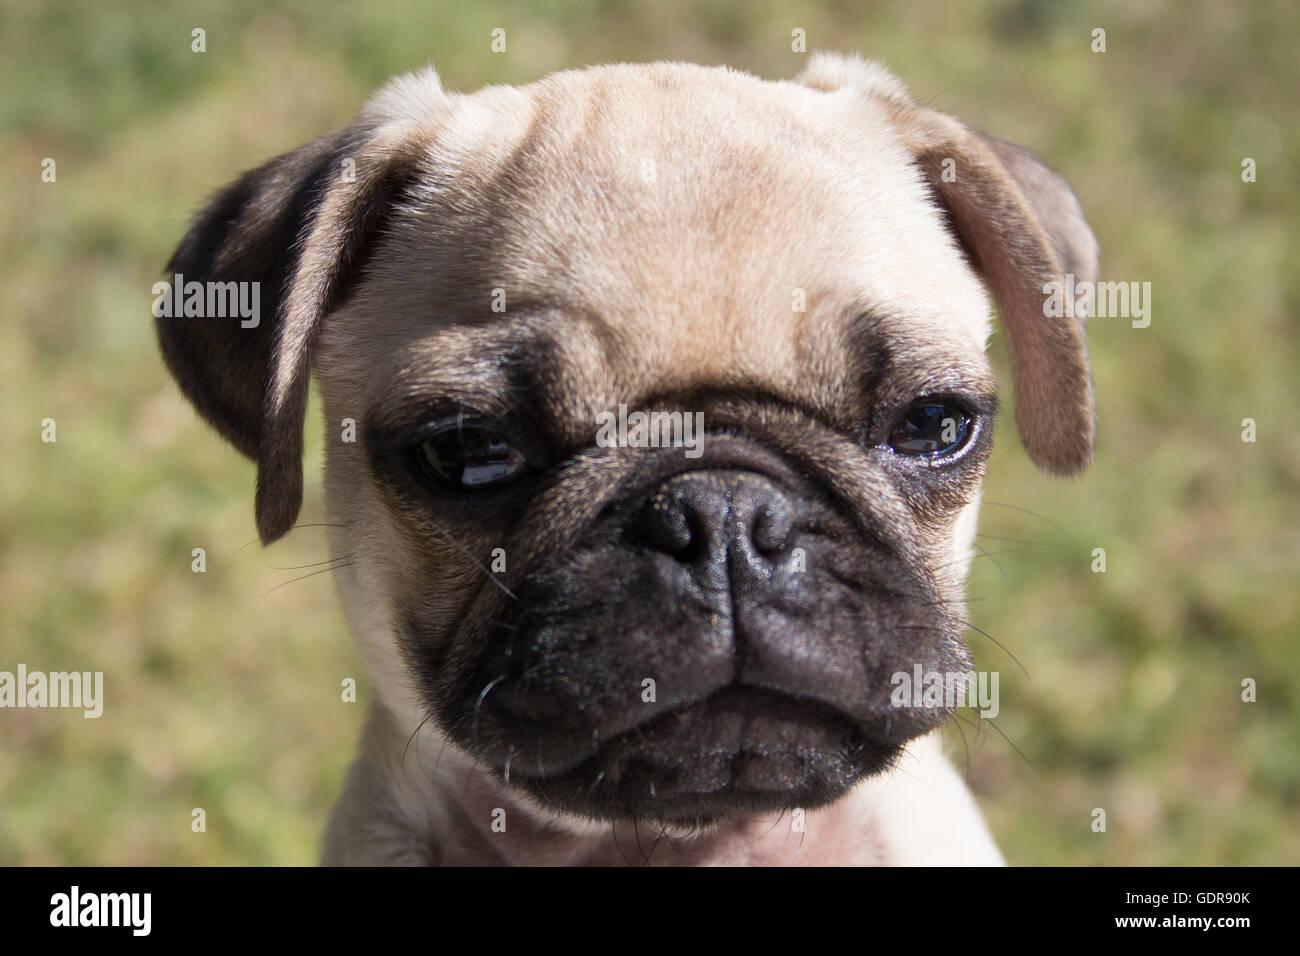 Handsome pug puppy. - Stock Image